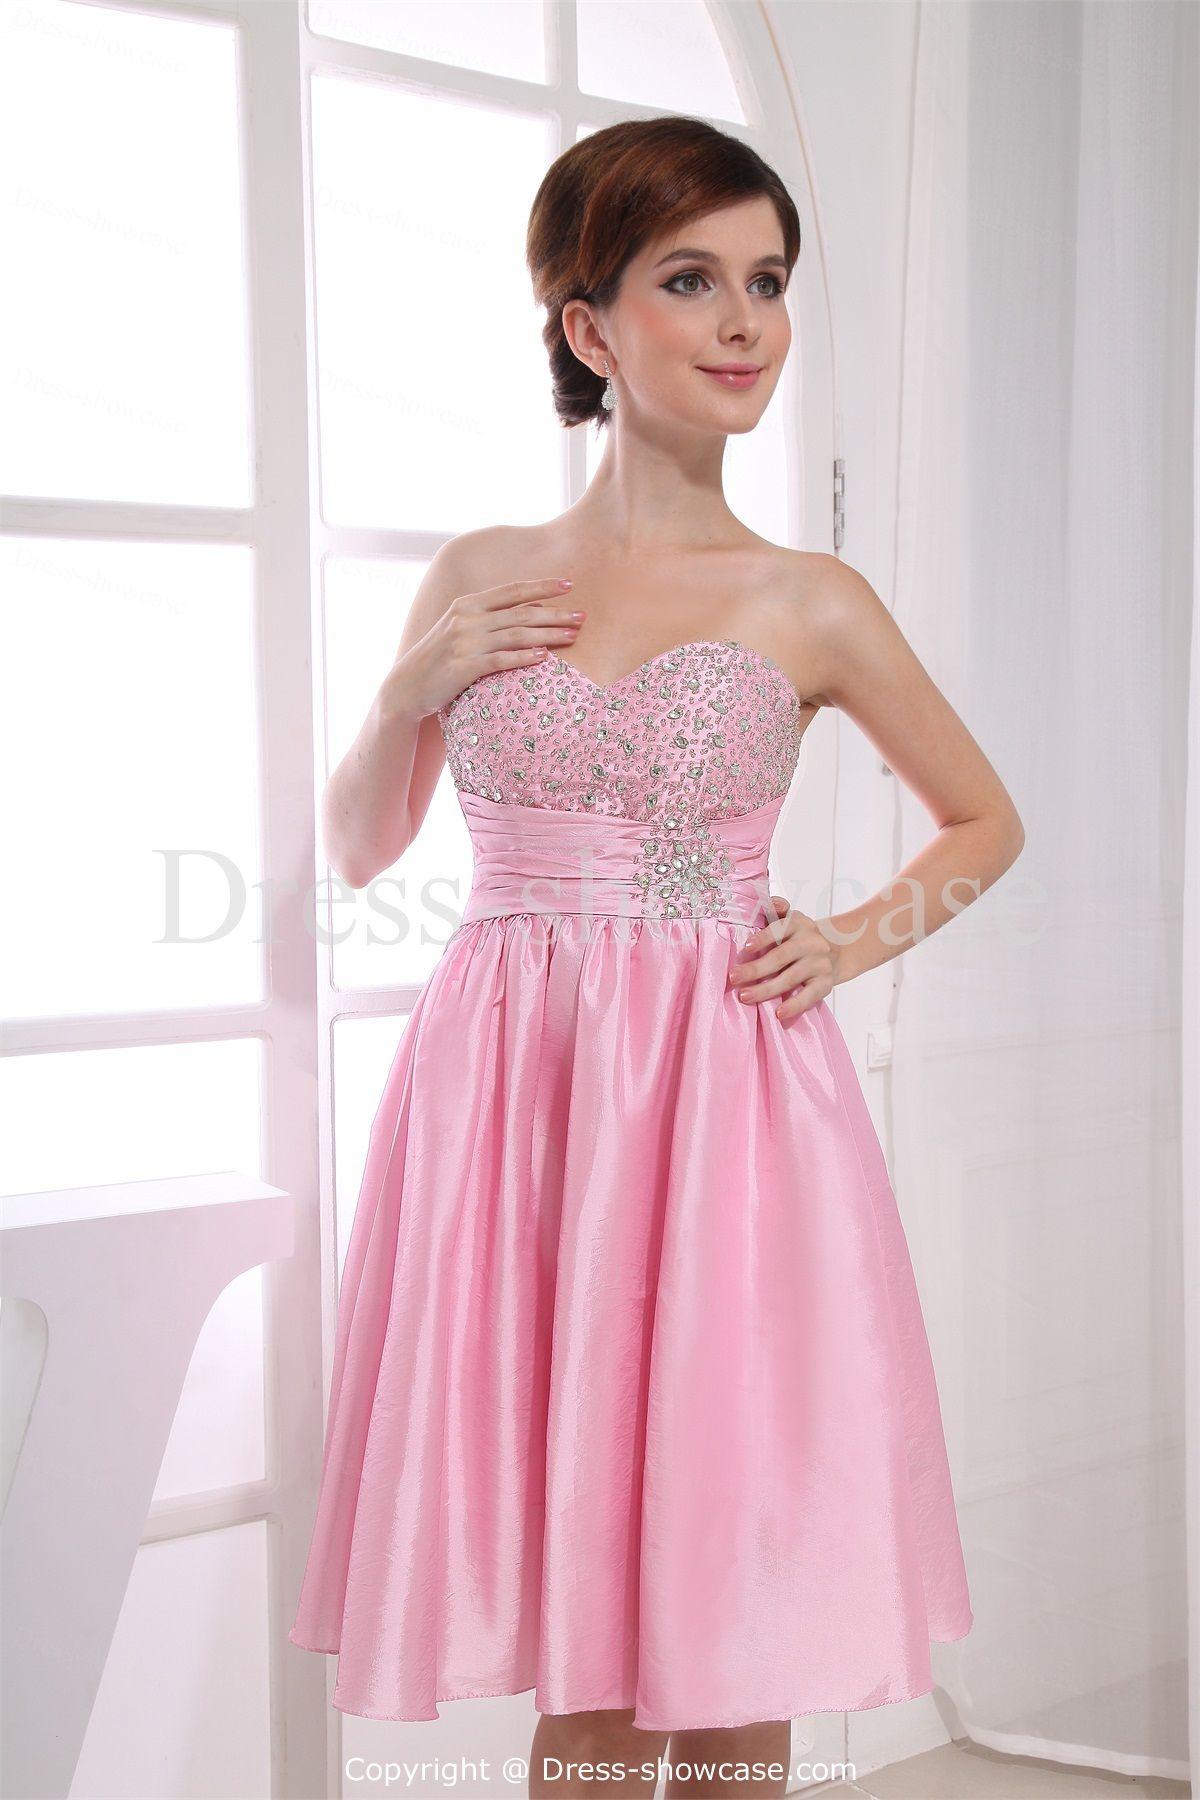 Pink Mini Taffeta Sweetheart Sweet 16 Dress | sweet16 outfits ...